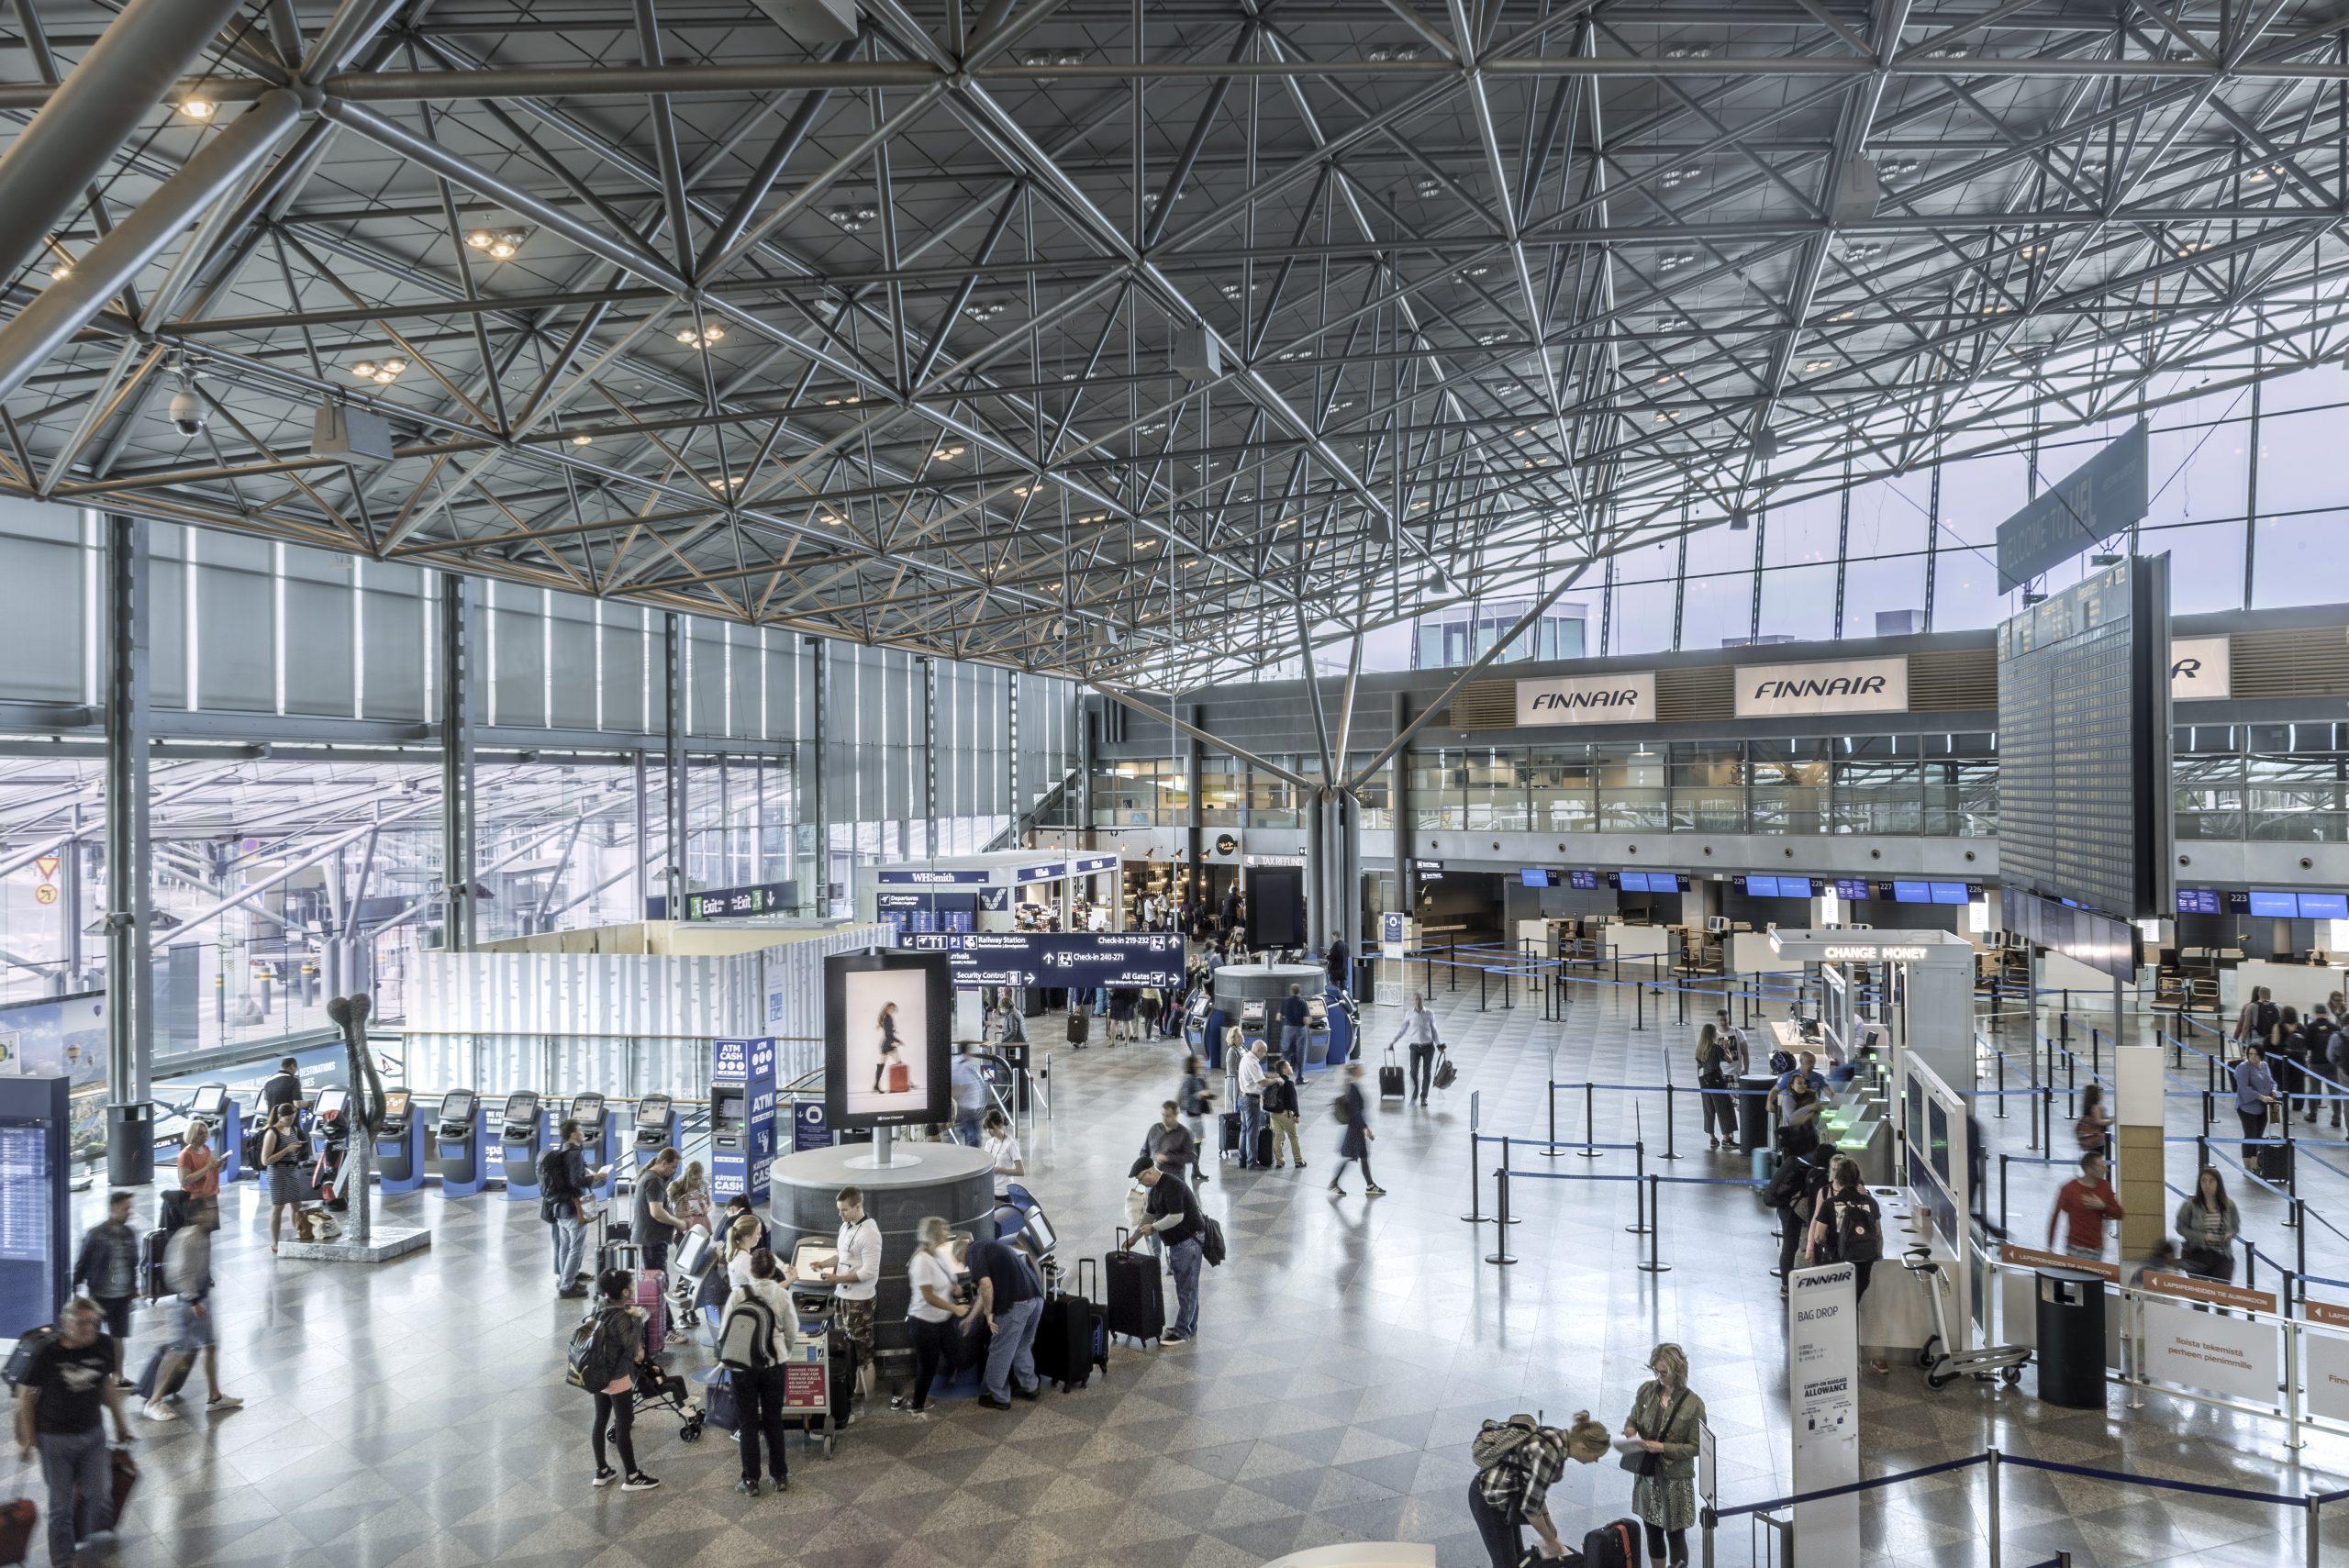 Afgangshallen i Terminal 2 i Helsinki Airport. Foto: Finavia